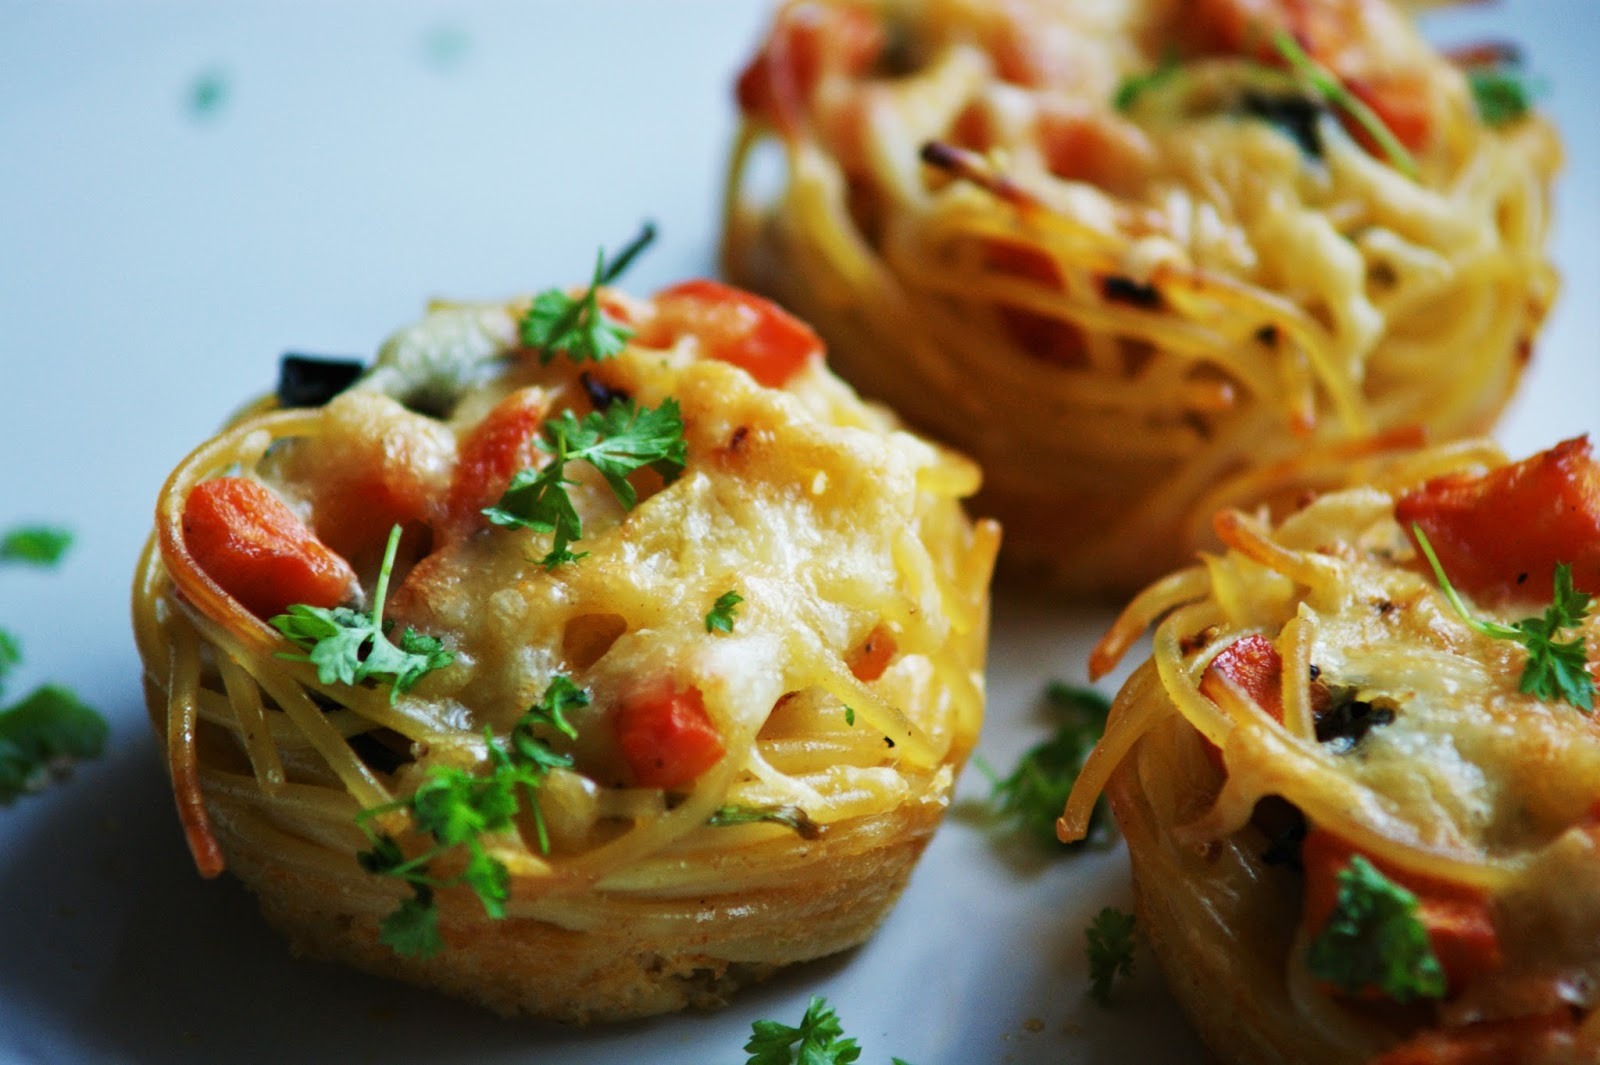 vegetarische spaghetti muffins papilio maackii. Black Bedroom Furniture Sets. Home Design Ideas